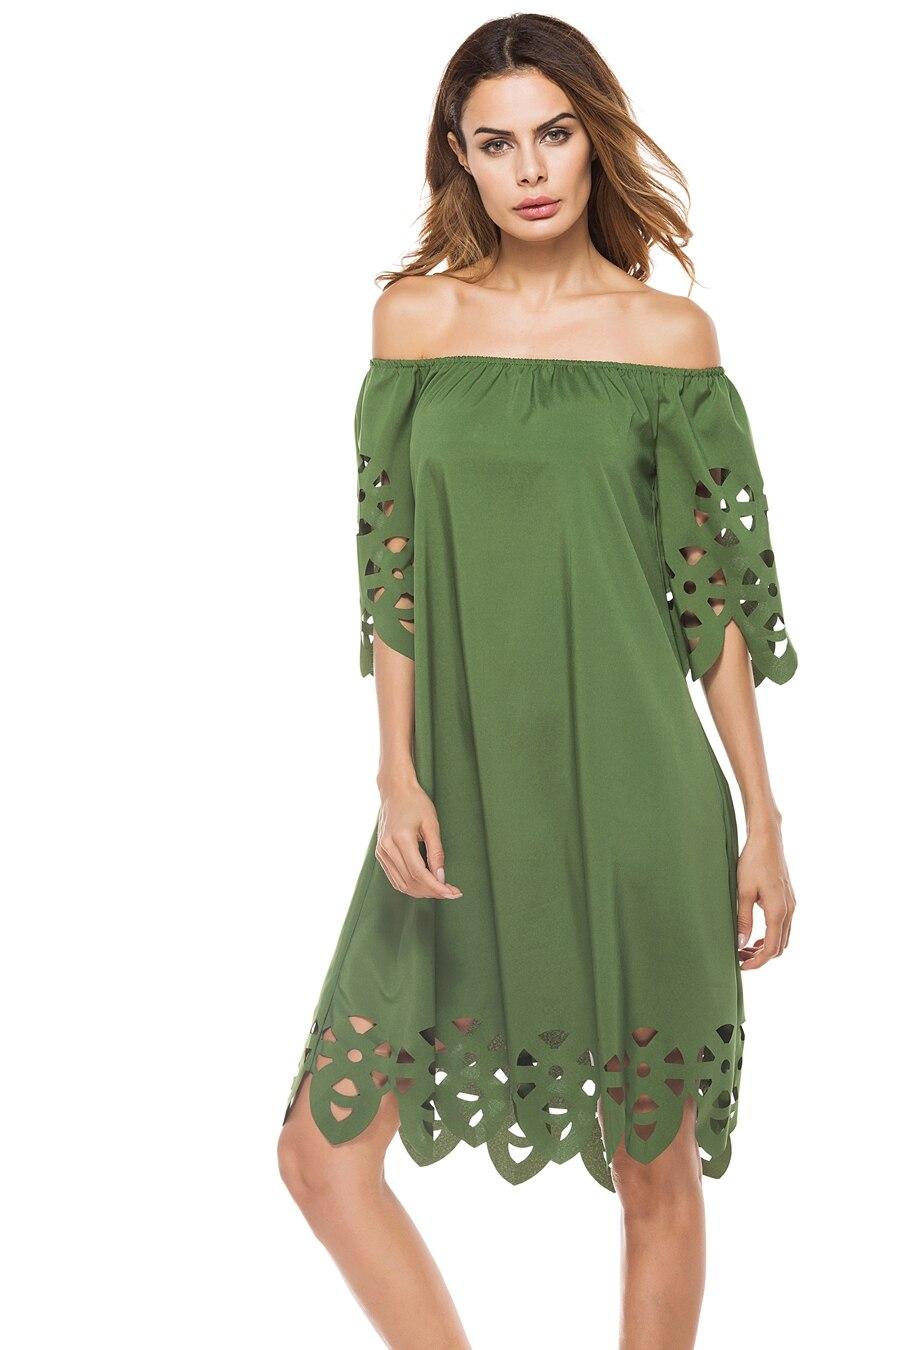 shoulderless One-line neck tube top hollow sexy burnt flower dress enlarge